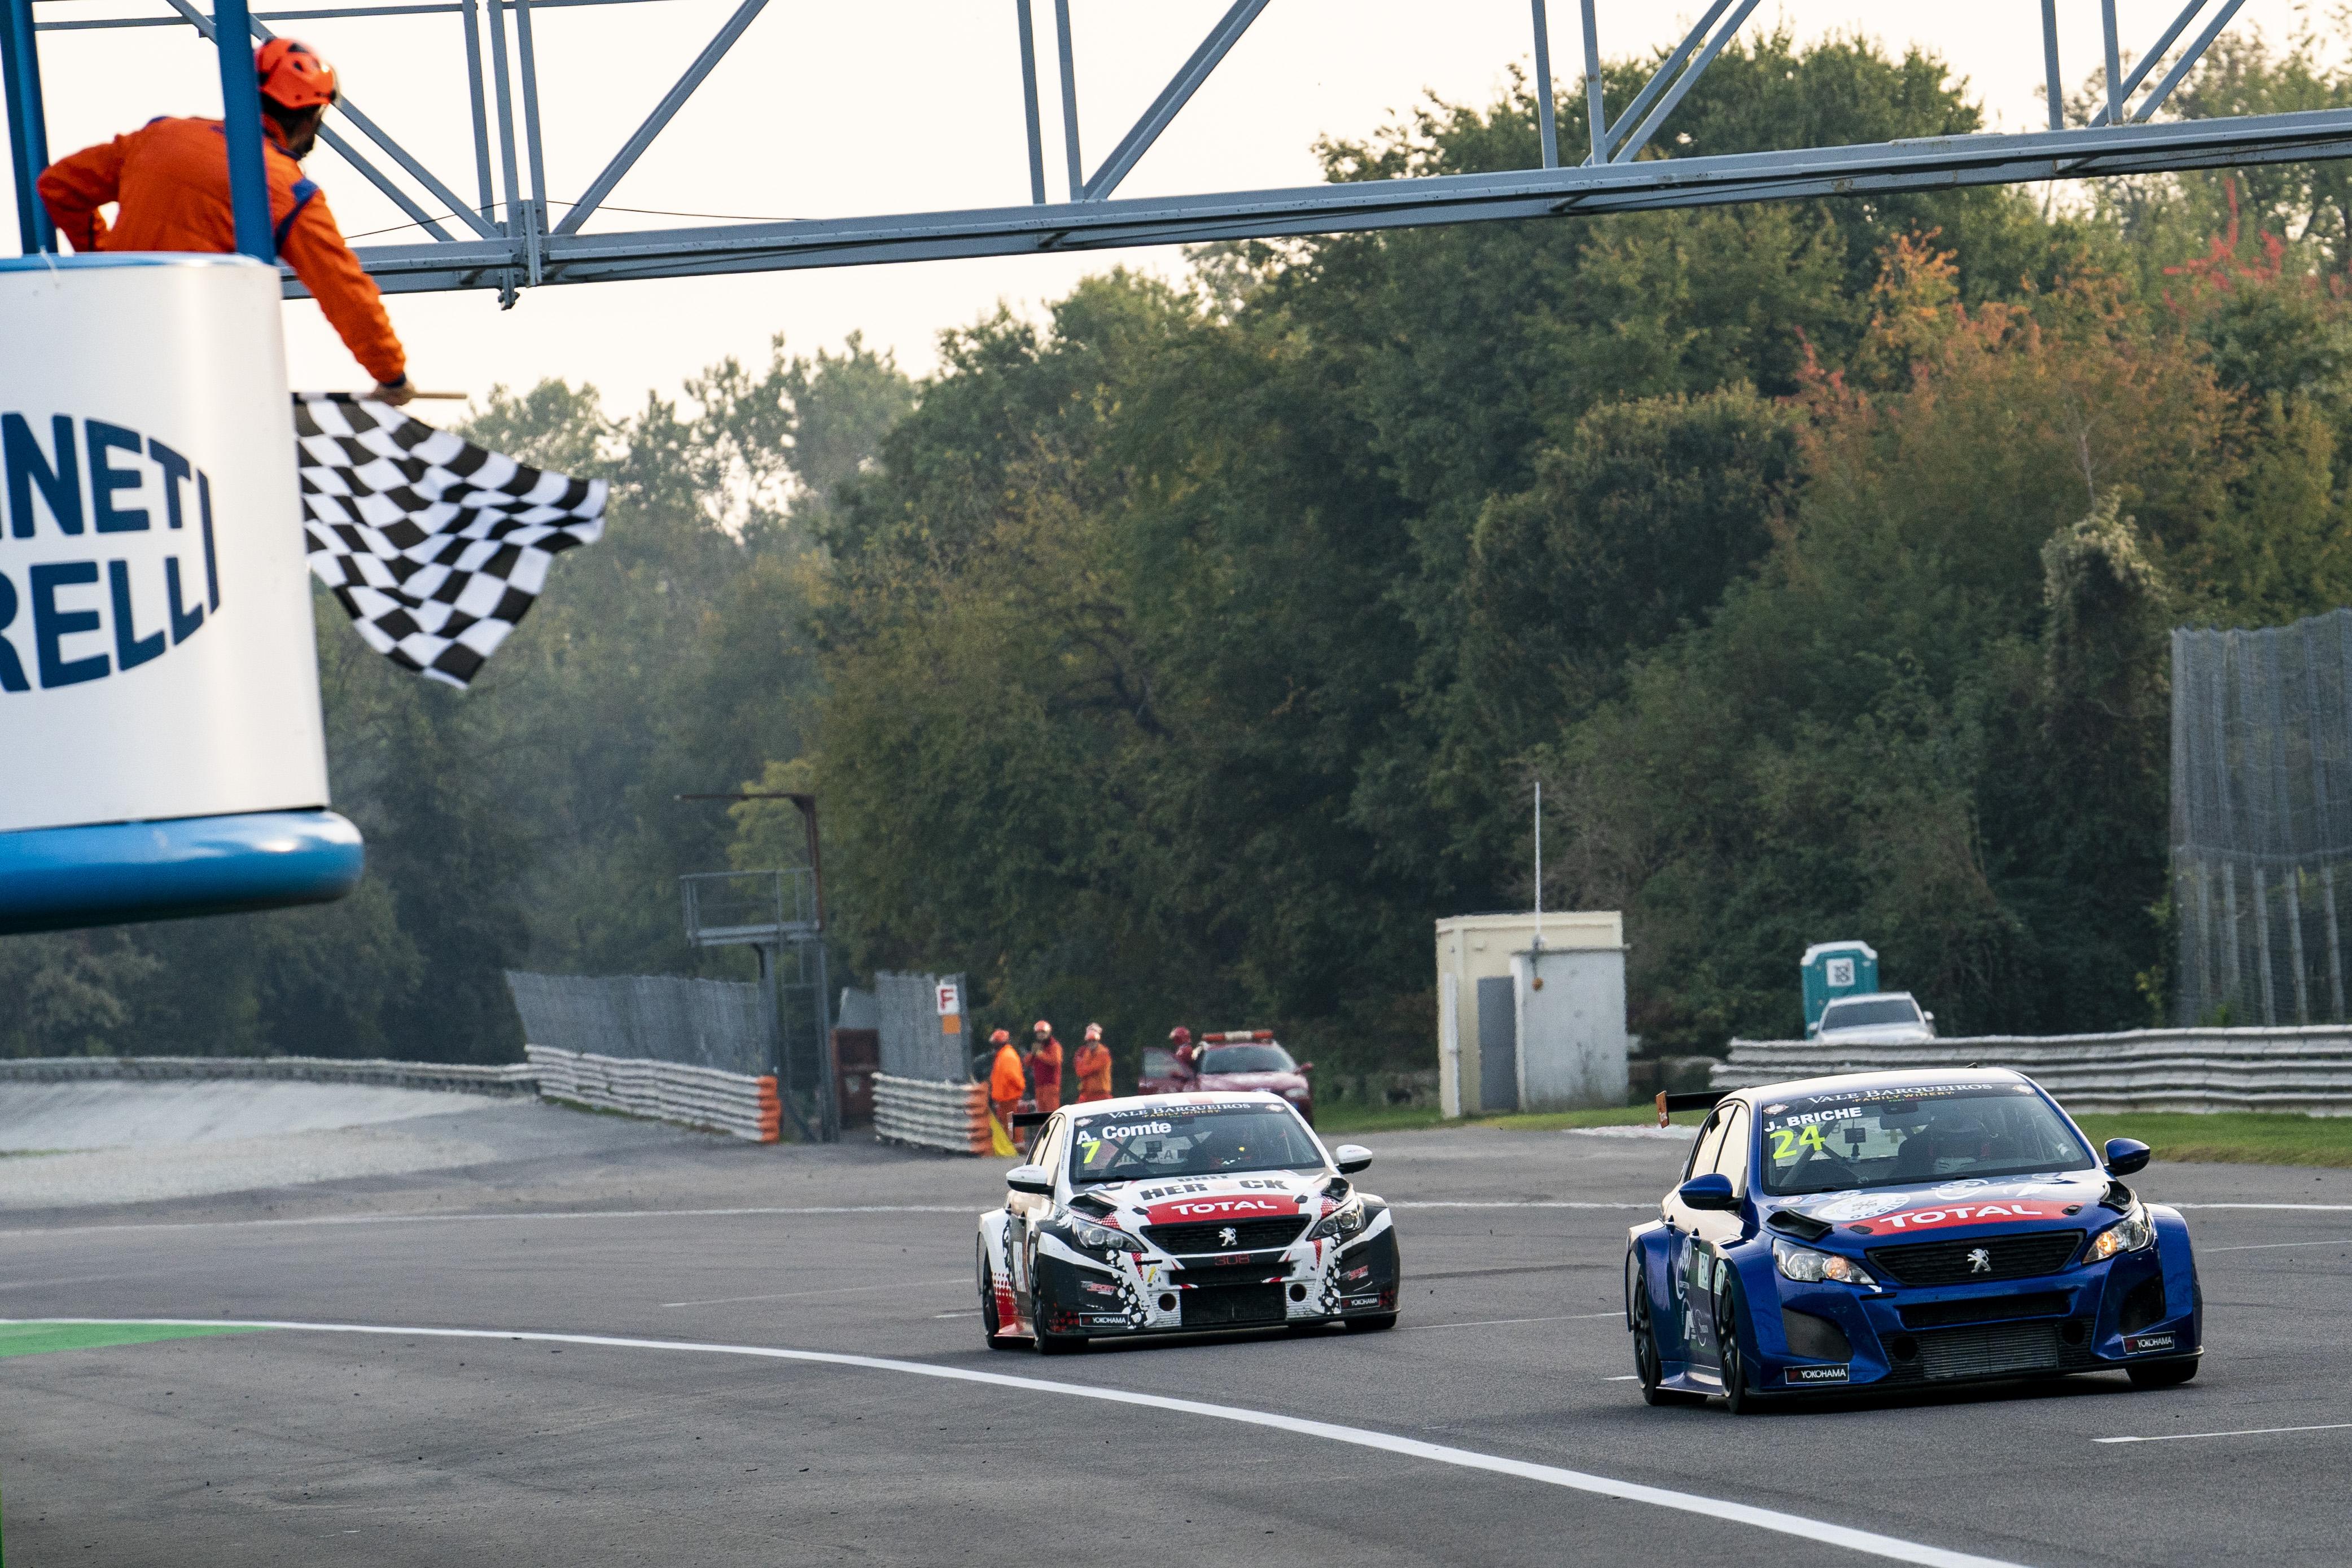 2019-2019_monza_race_1---2019_eur_monza_r1_24_julien_briche_34.jpg